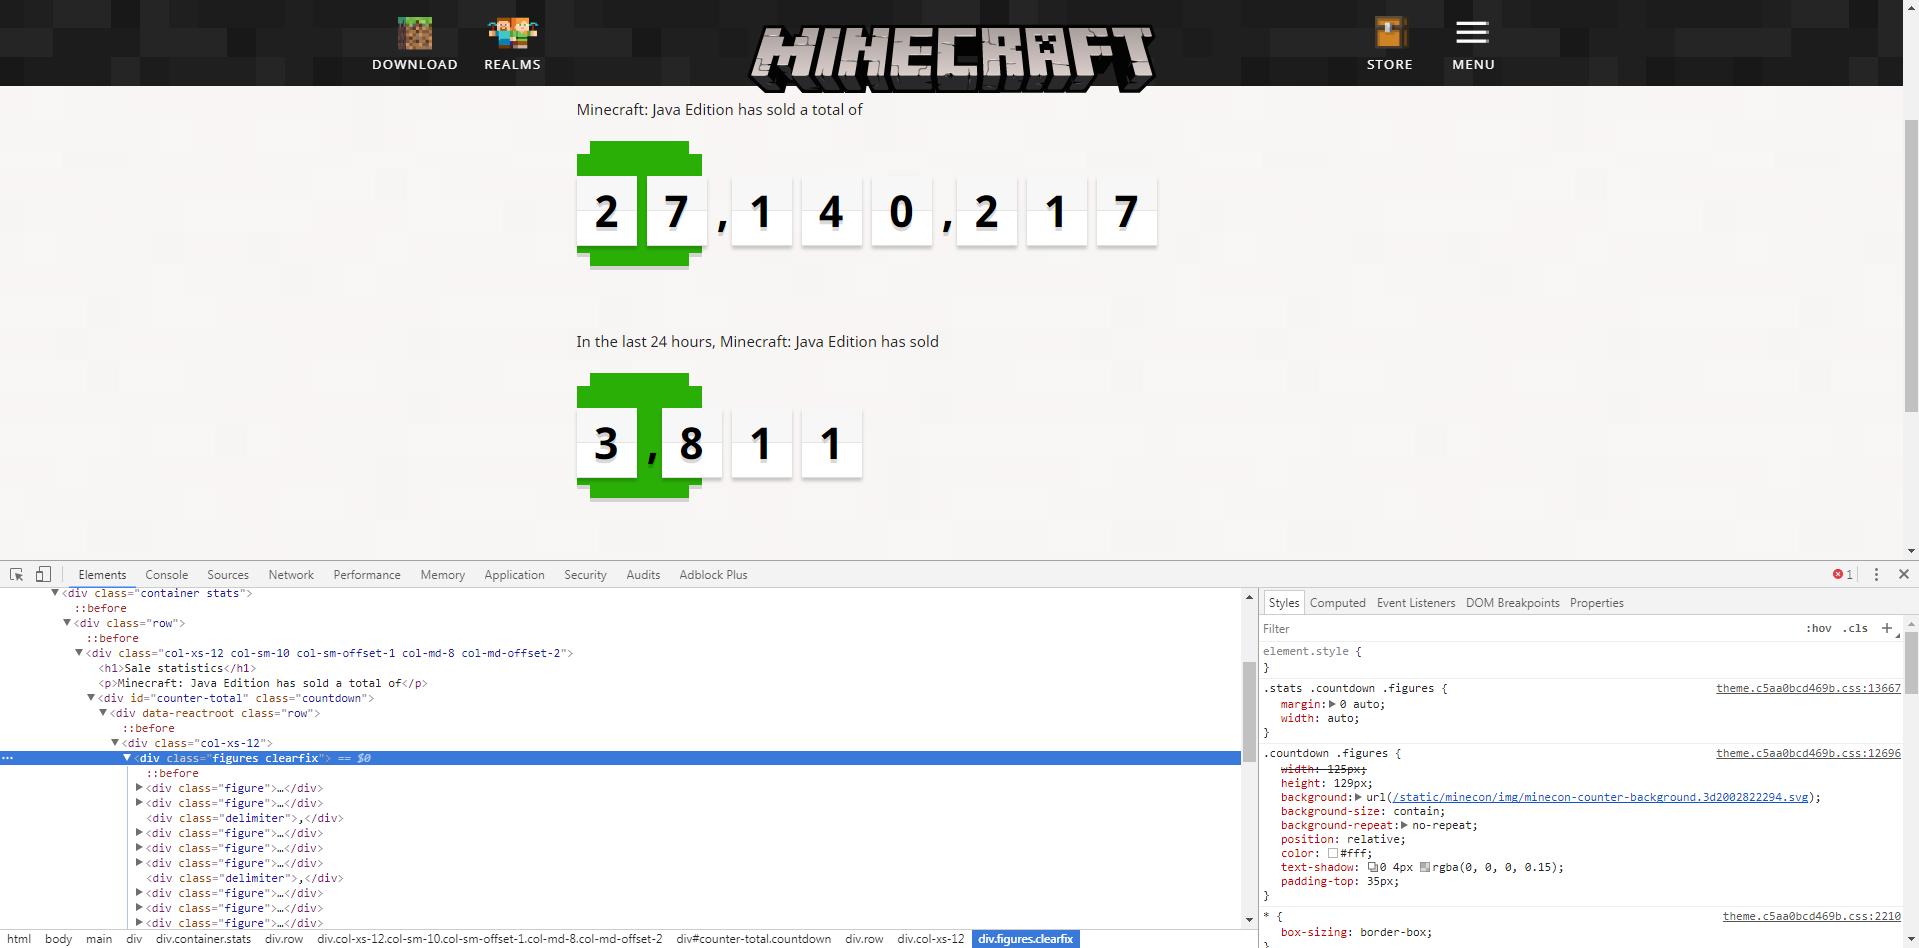 WEB-924] minecraft net statistics counters use Minecon counter